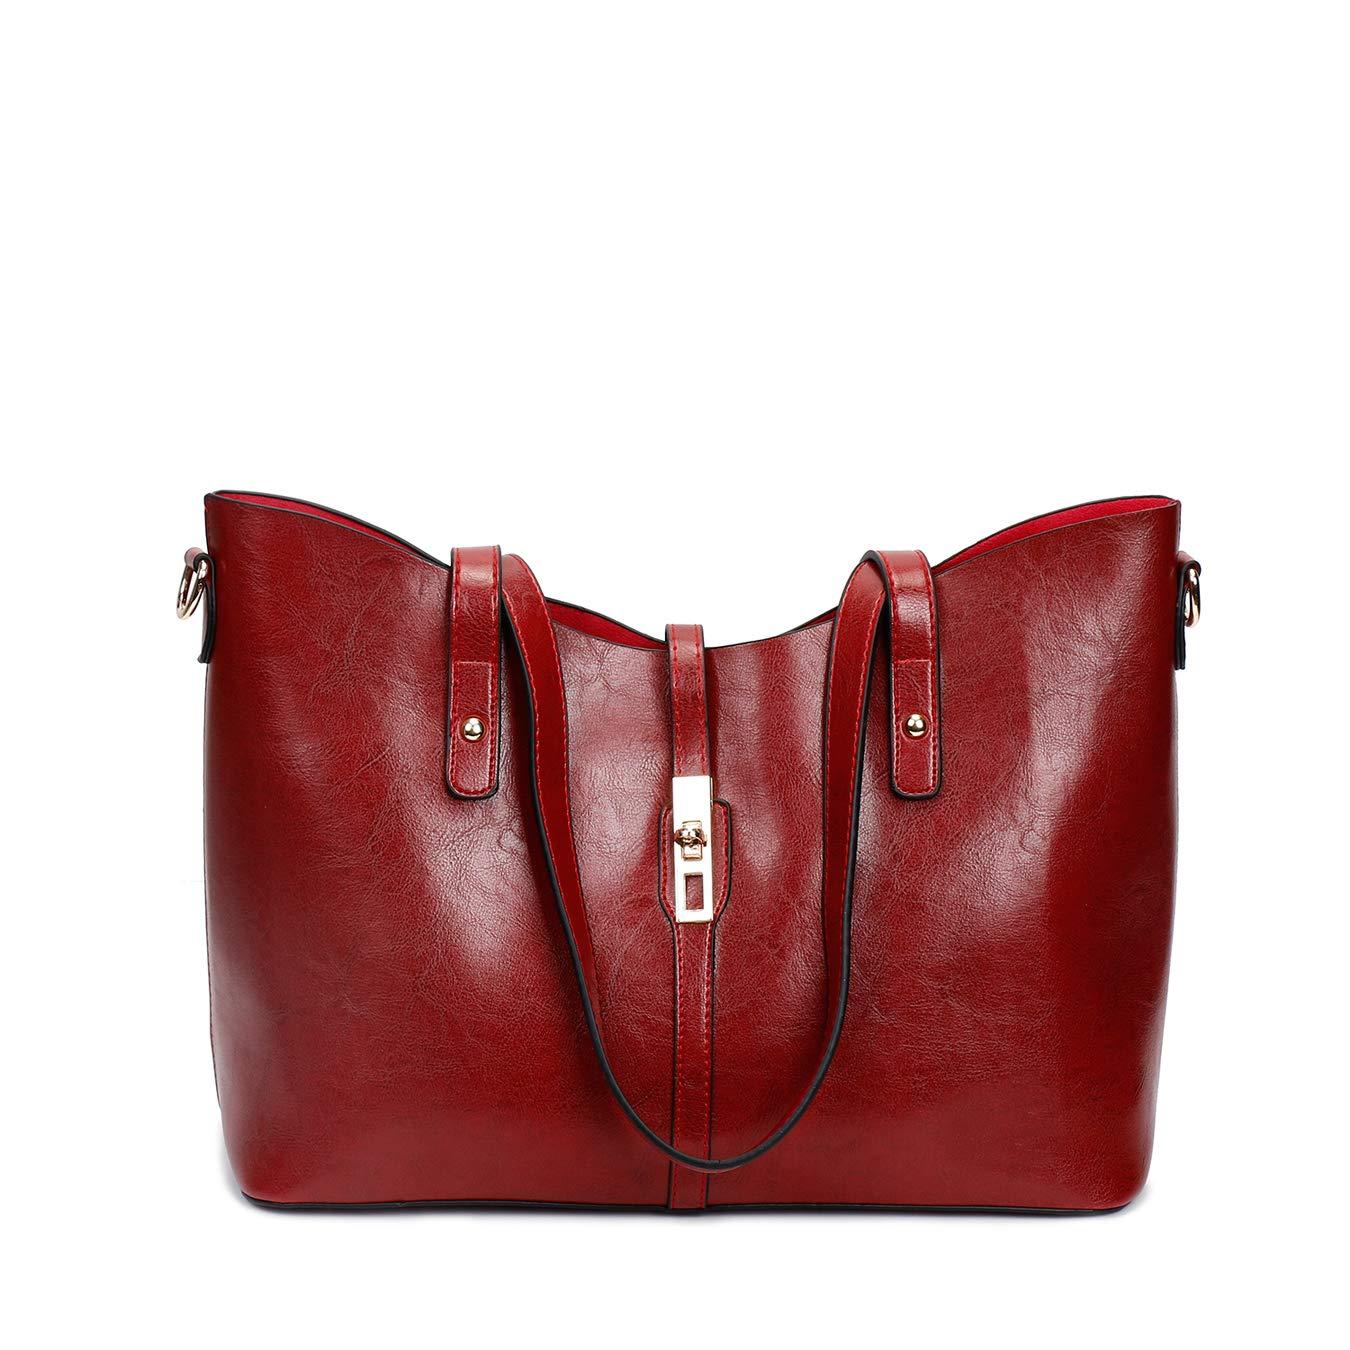 Large Purses Sets Handbags for Women Leather Tote Hobo Bags 4pcs